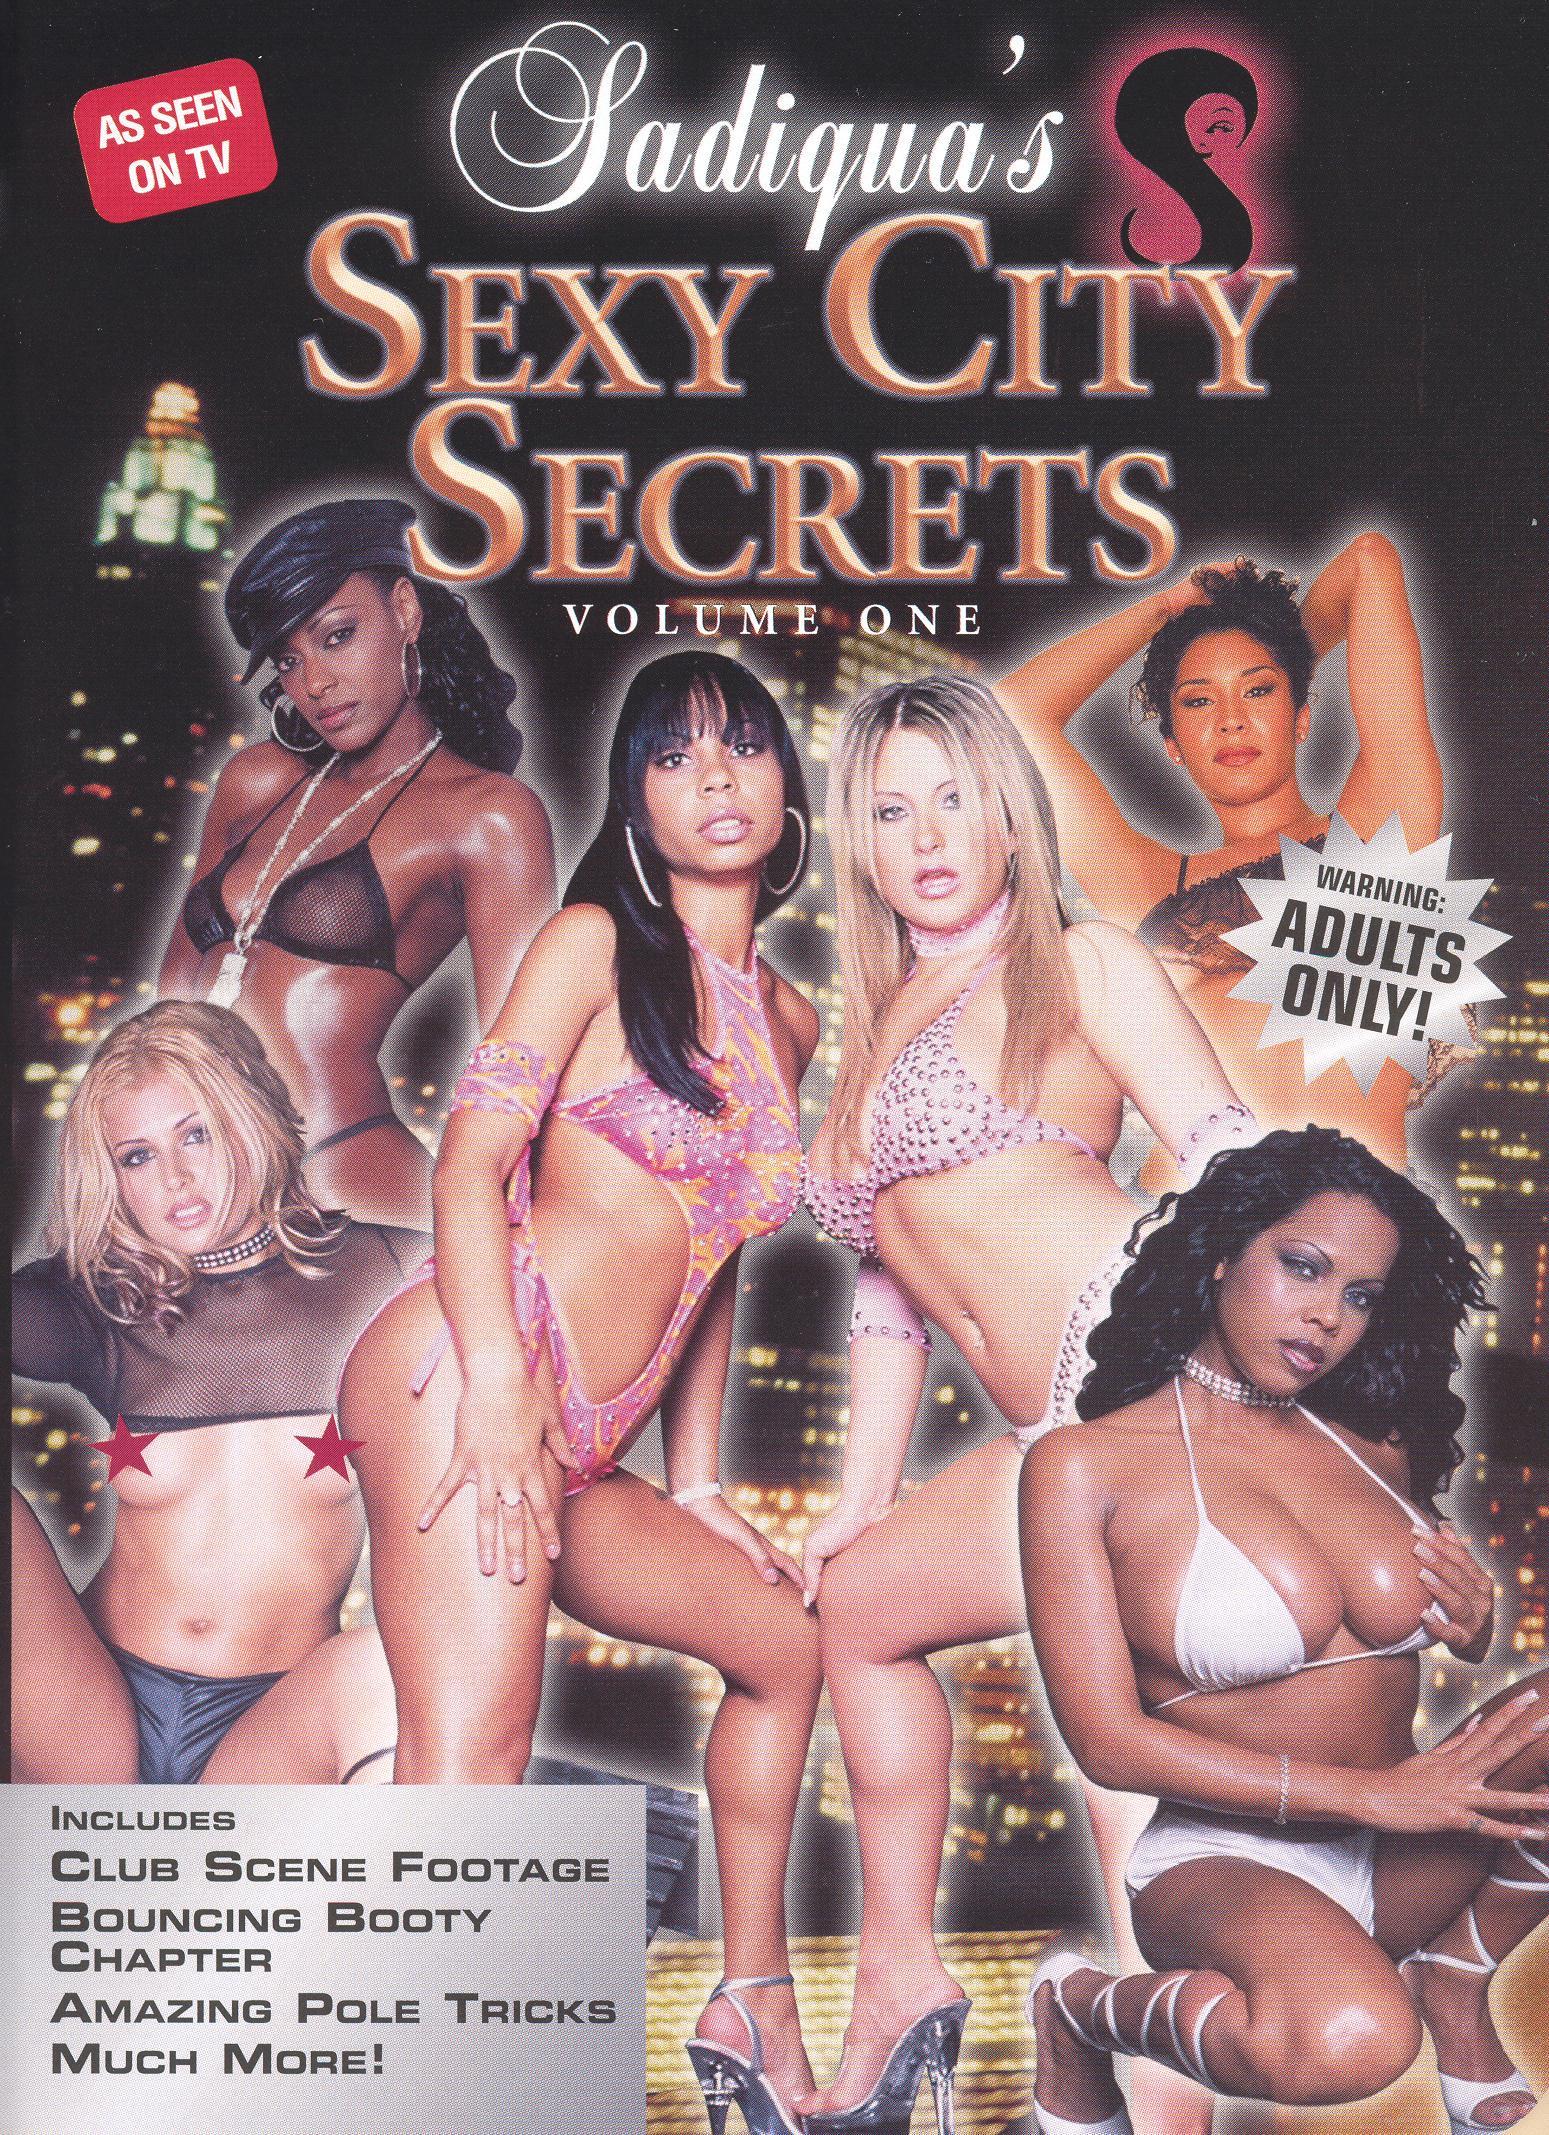 Sadiqua's Sexy City Secrets, Vol. 1